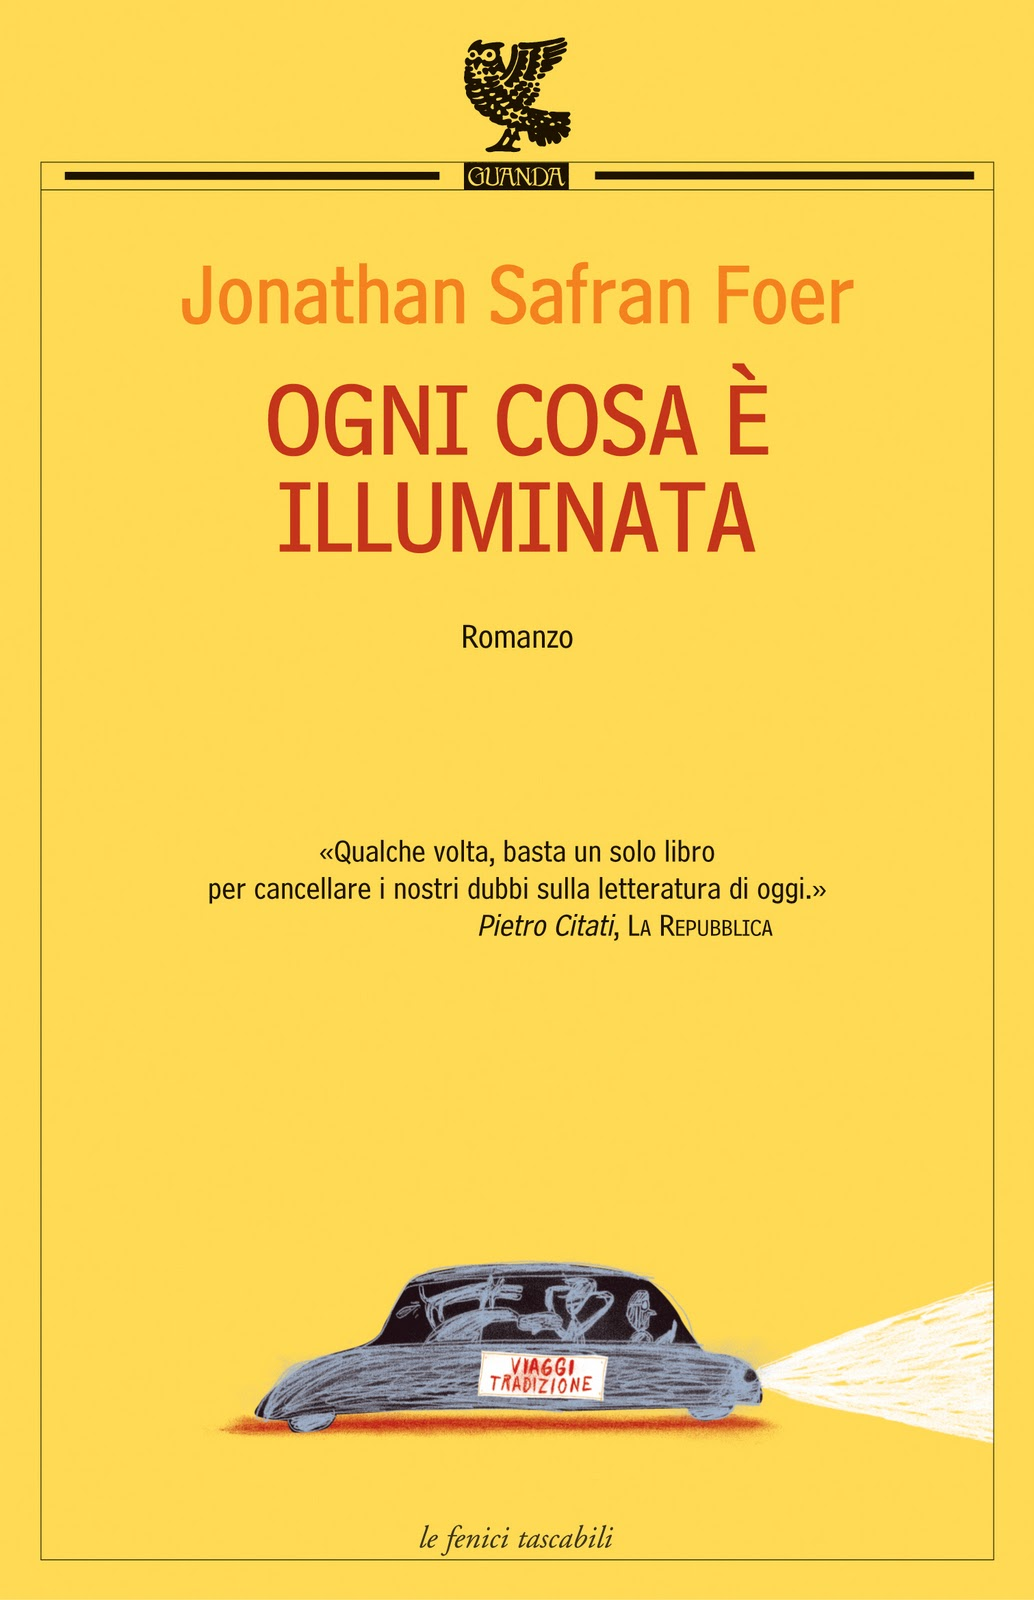 Jonathan Safran Foer, Ogni cosa è illuminata, Guanda